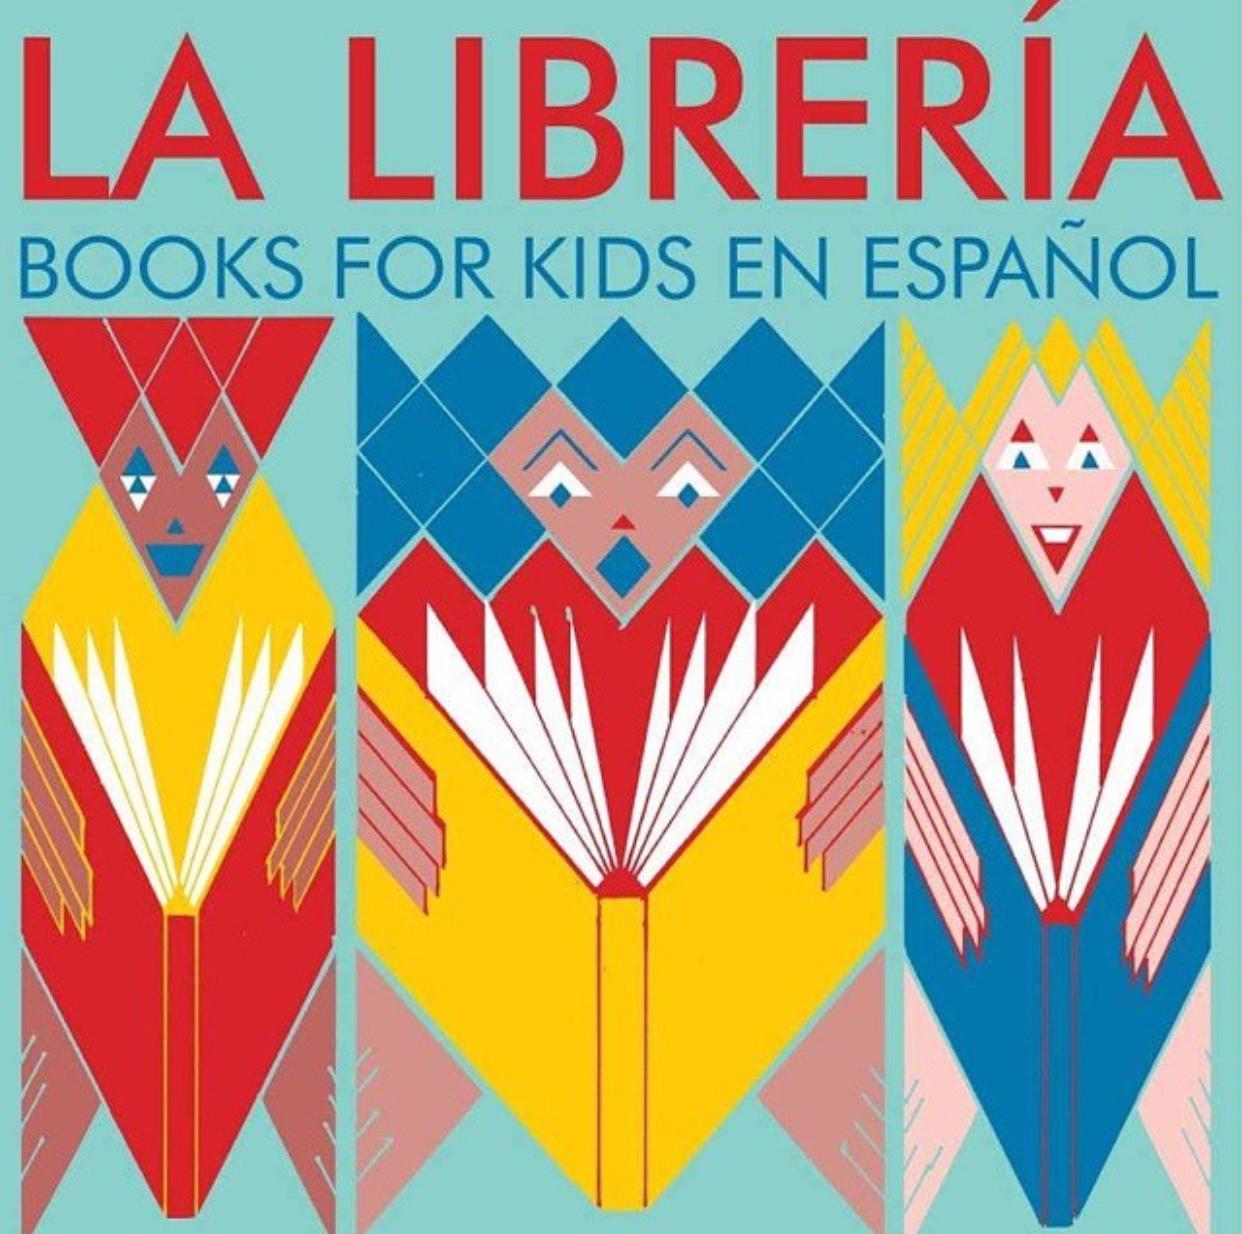 libreria2.jpg